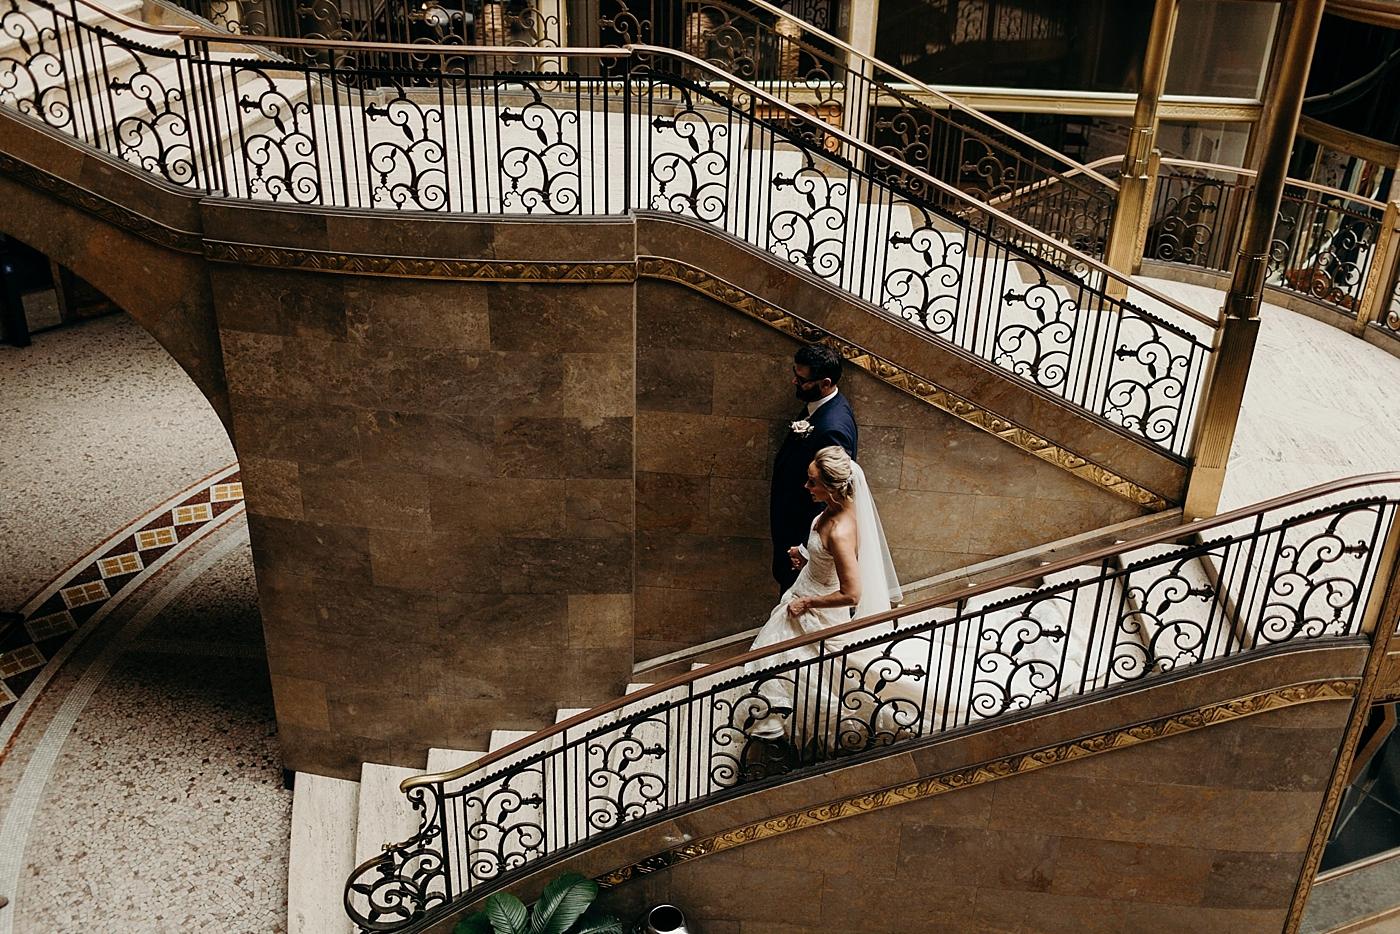 DowntownCLE-CibreroWedding-Kristin+Frank_LP_THEHEARTLANDERSCO-216.jpg